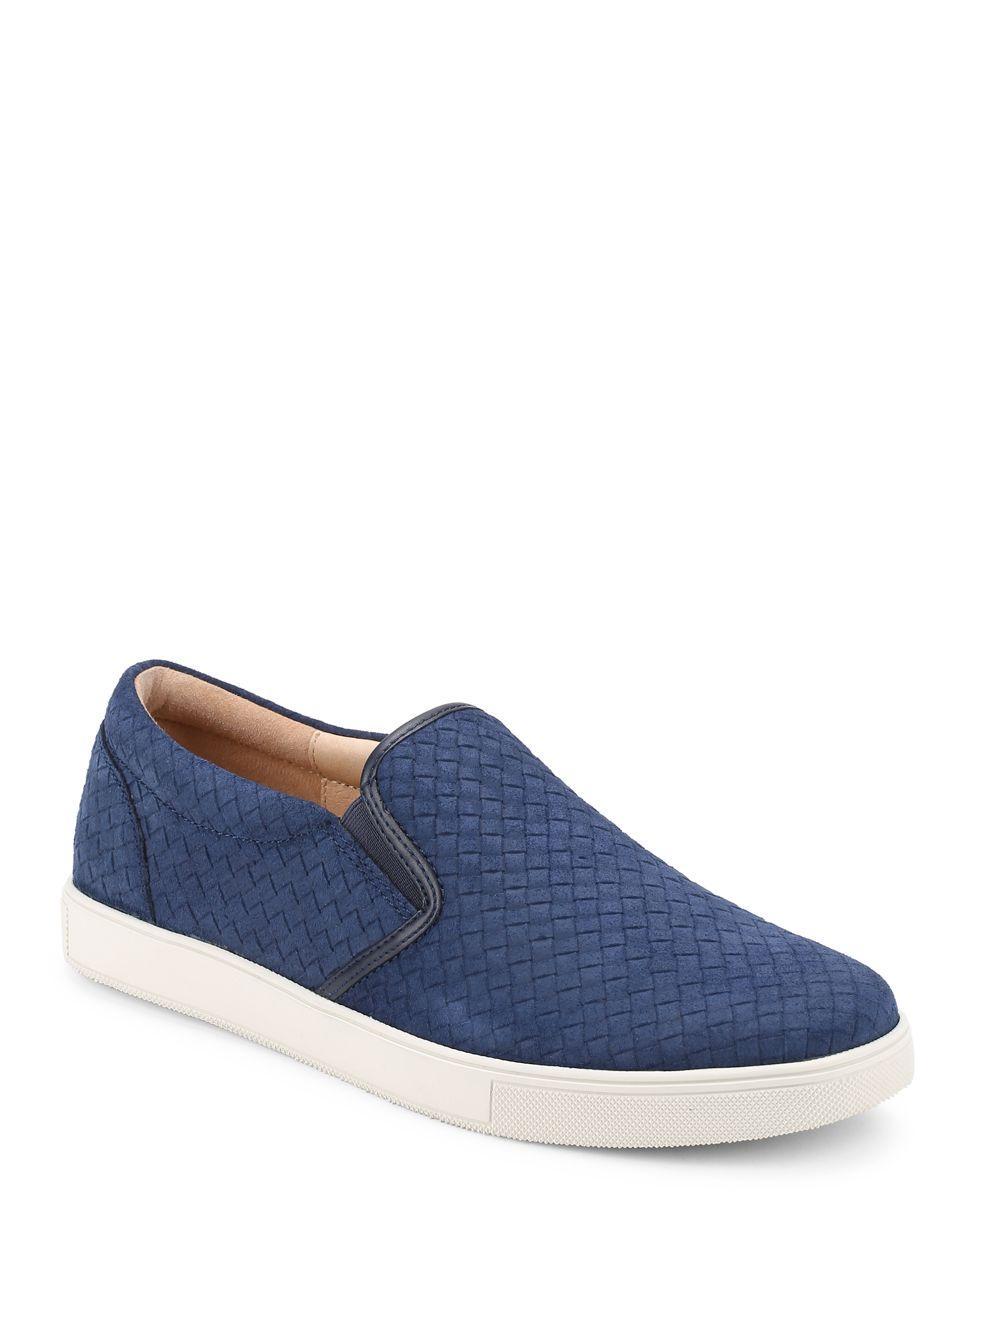 Sam Edelman Eric Basketweave Slip On Sneakers In Blue For